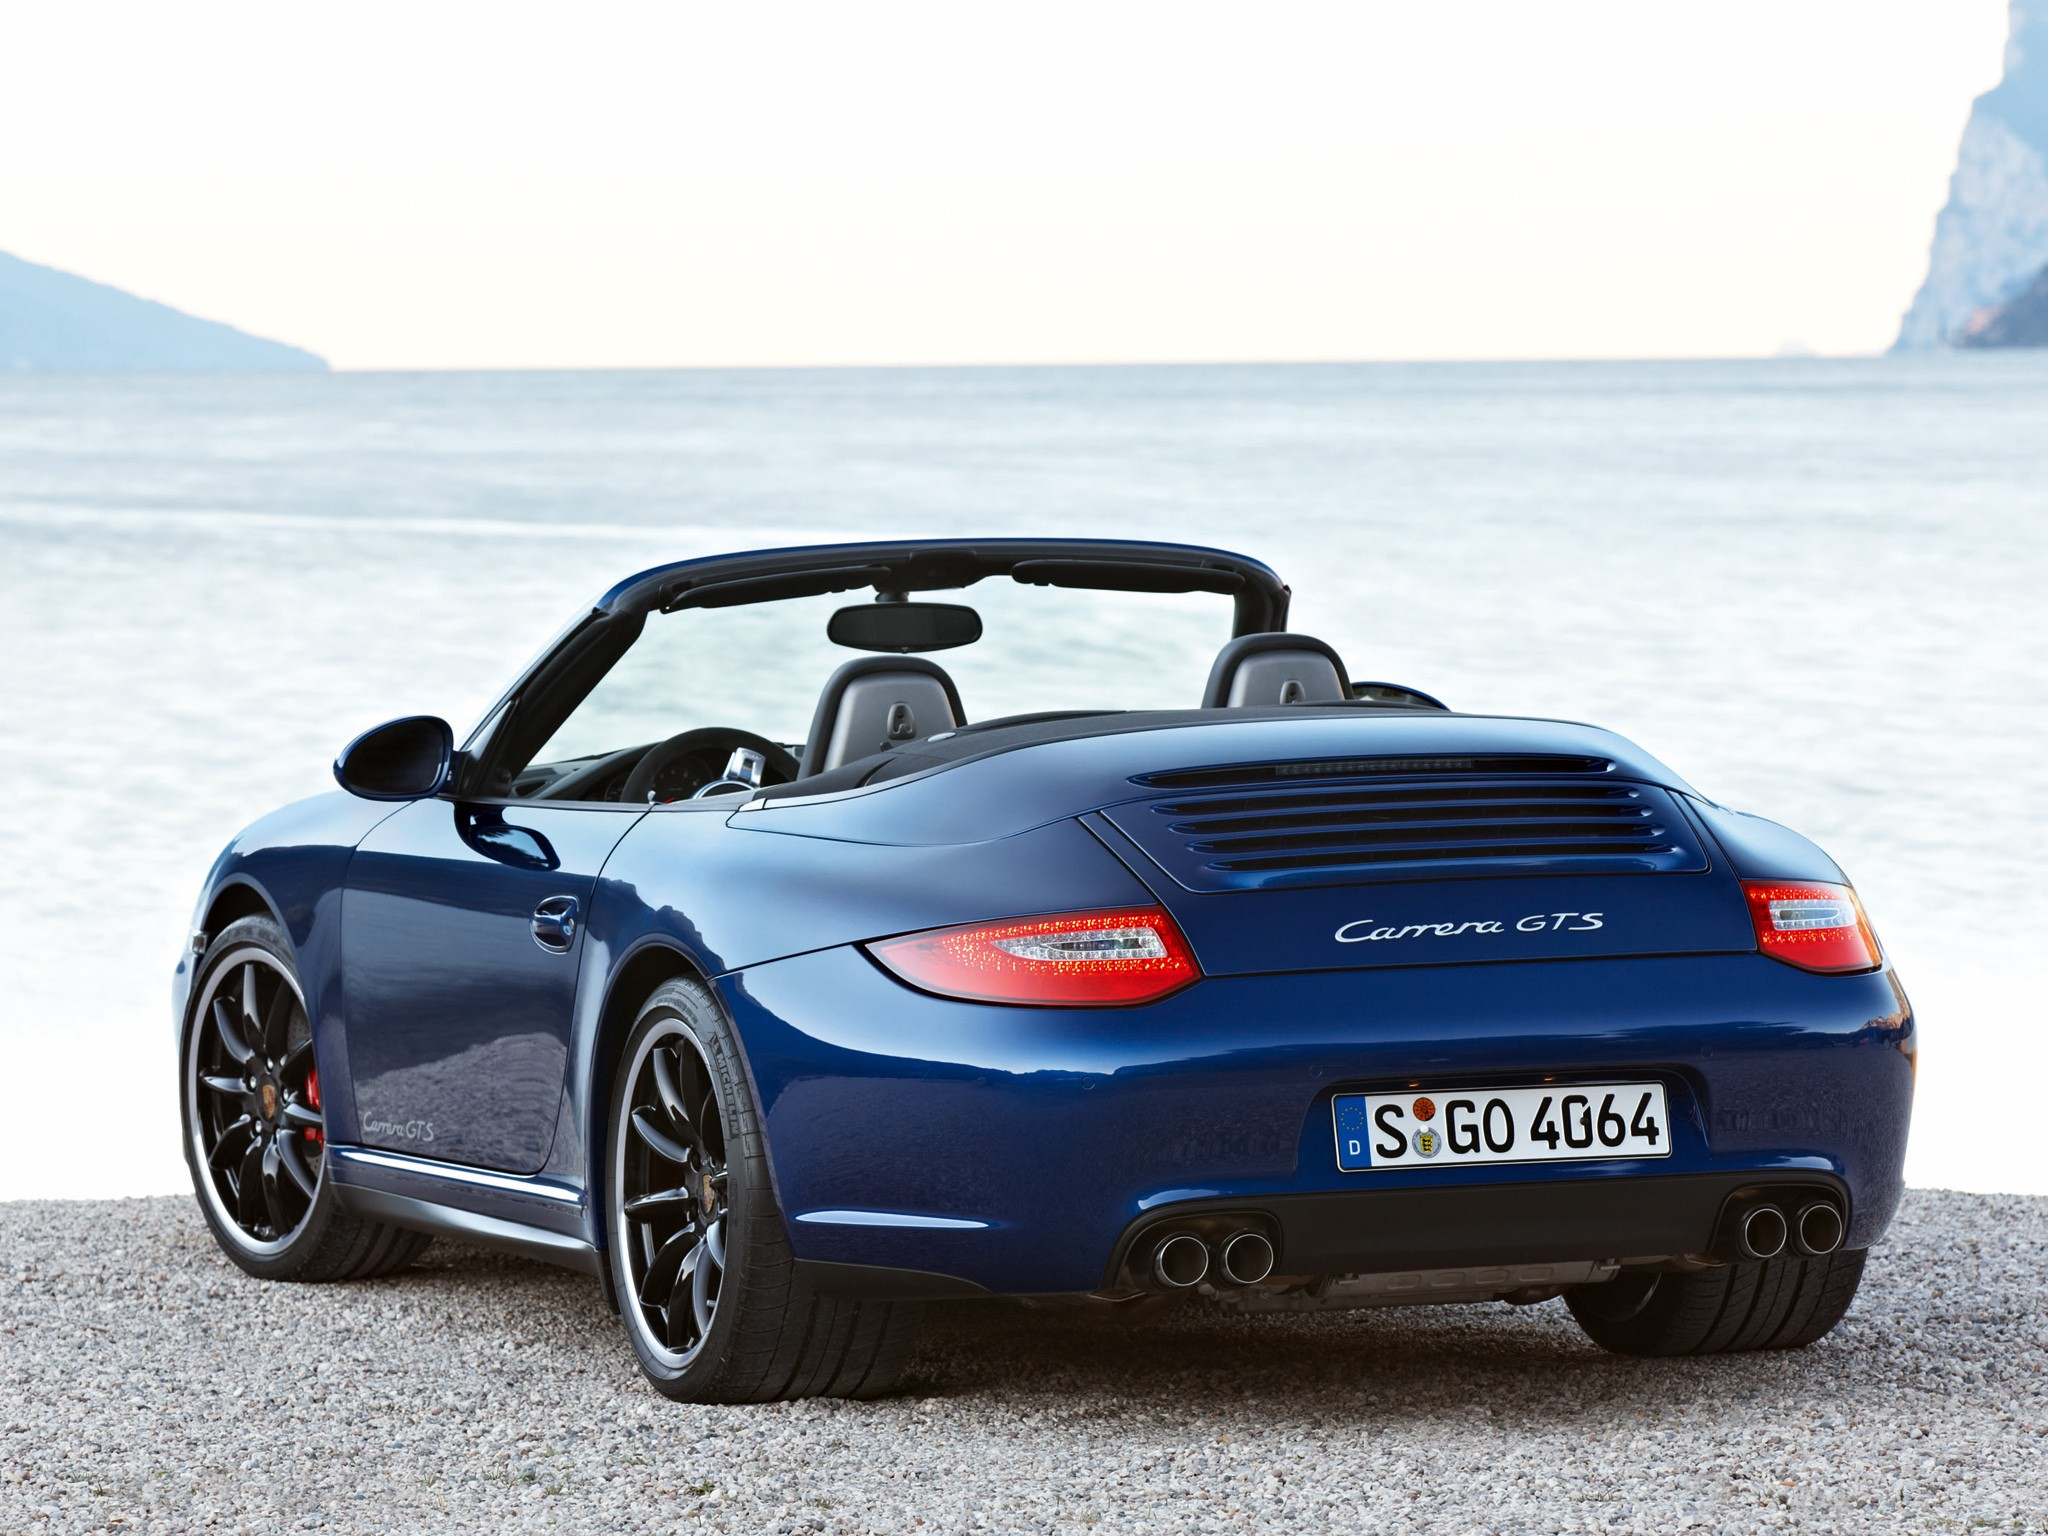 porsche 911 carrera gts cabriolet 997 2010 2011. Black Bedroom Furniture Sets. Home Design Ideas